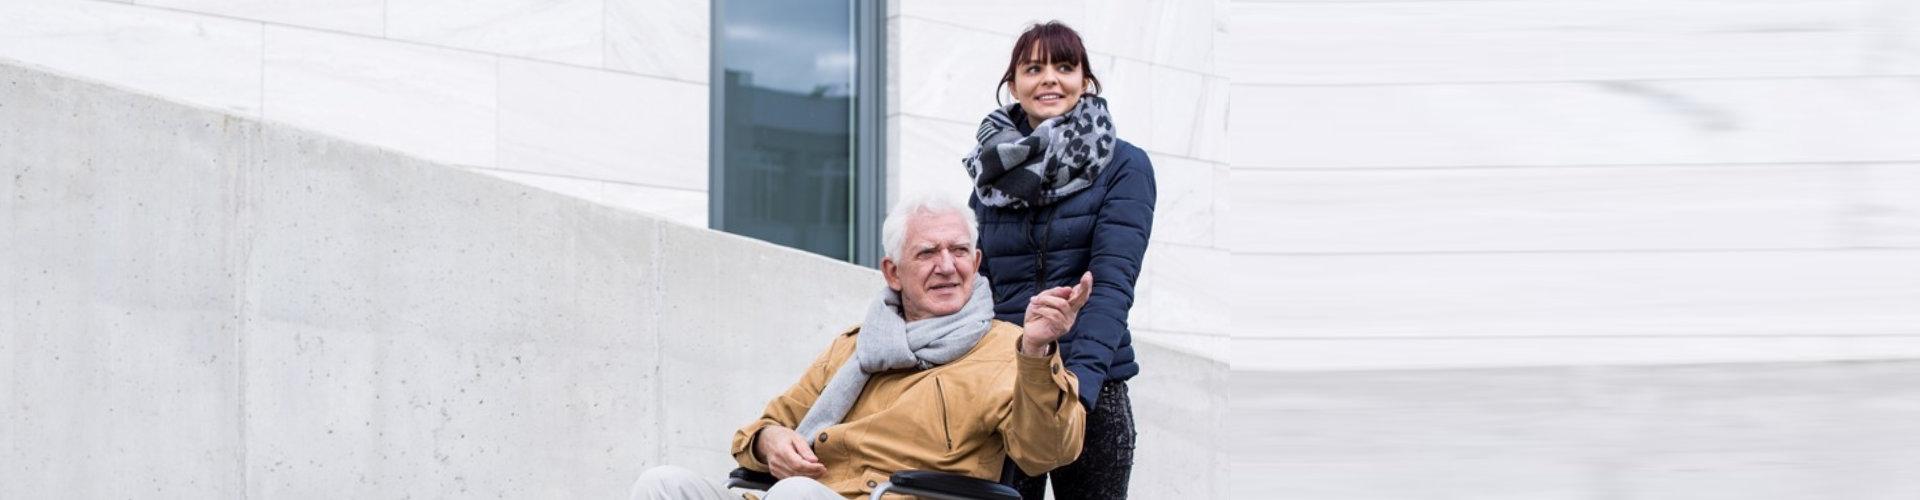 female caregiver and senior man strolling